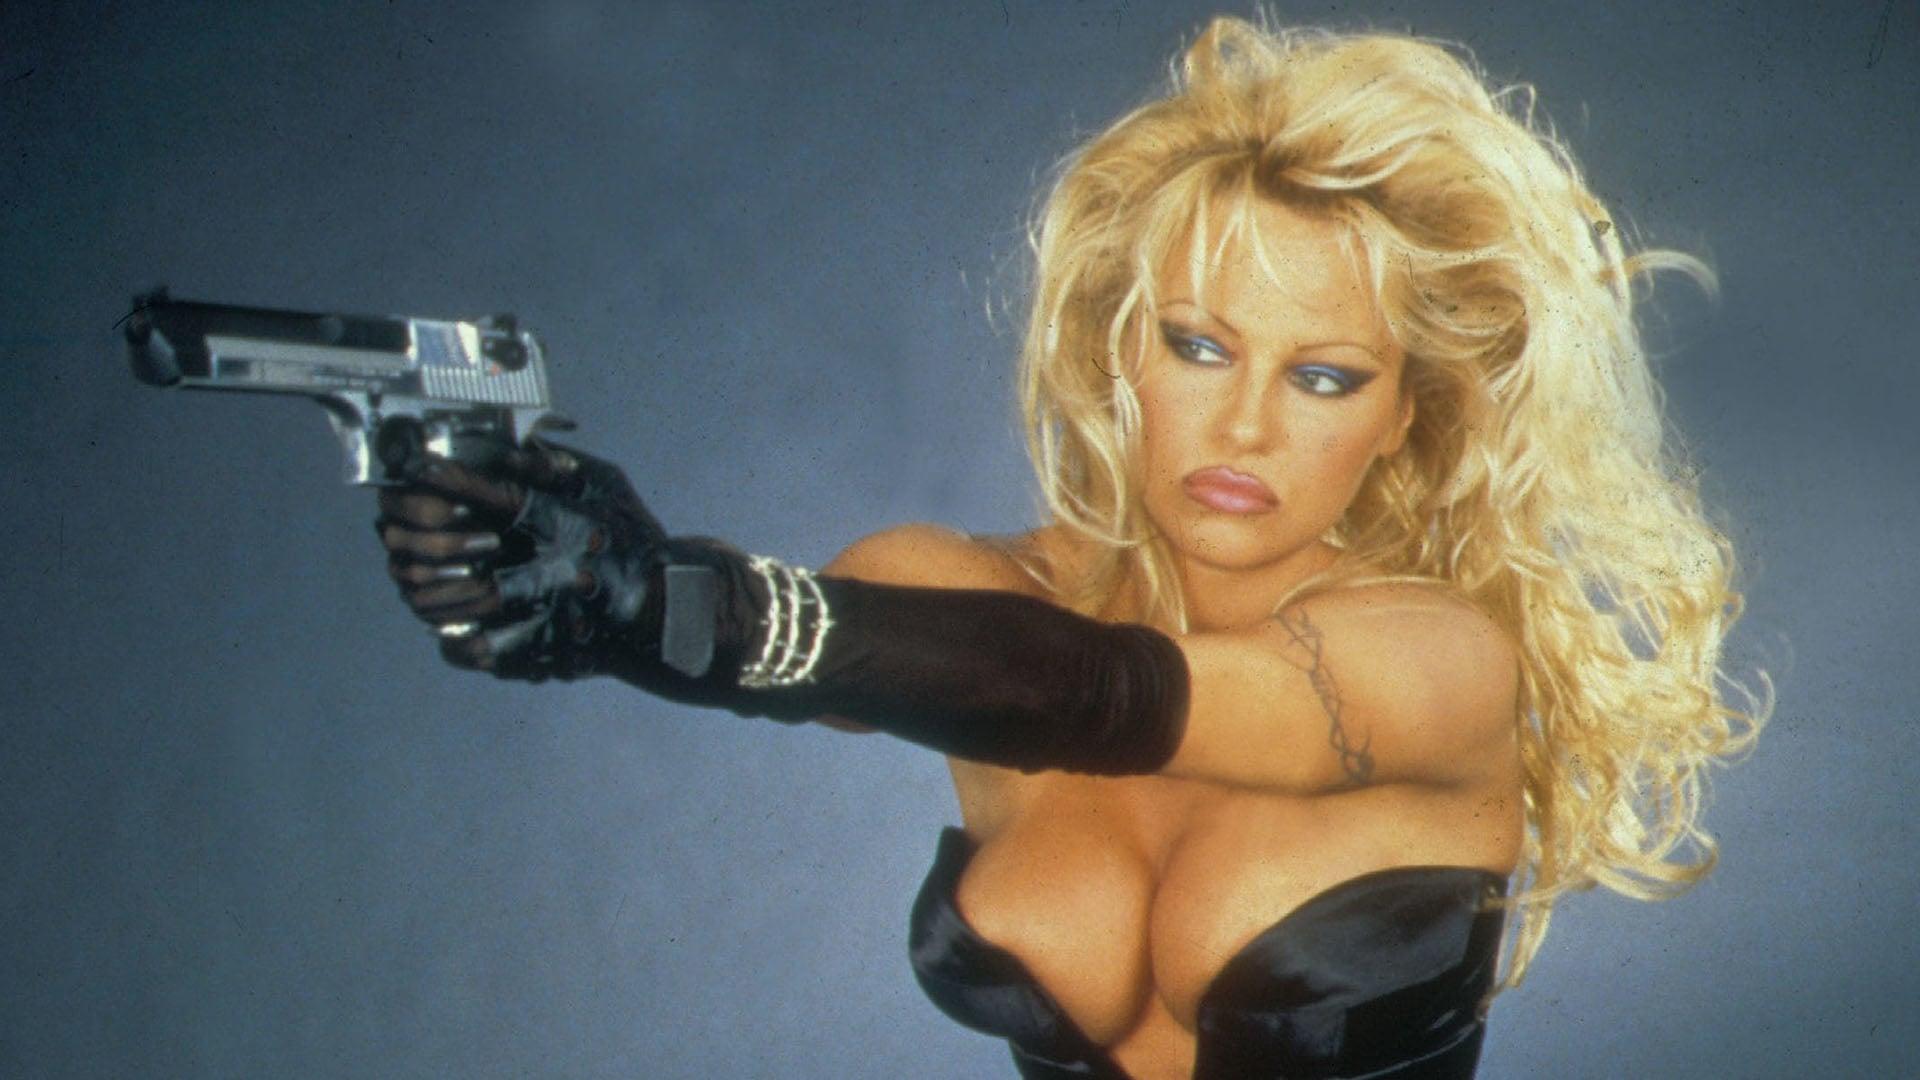 Pamela Anderson Lee as Barb Wire (1996)